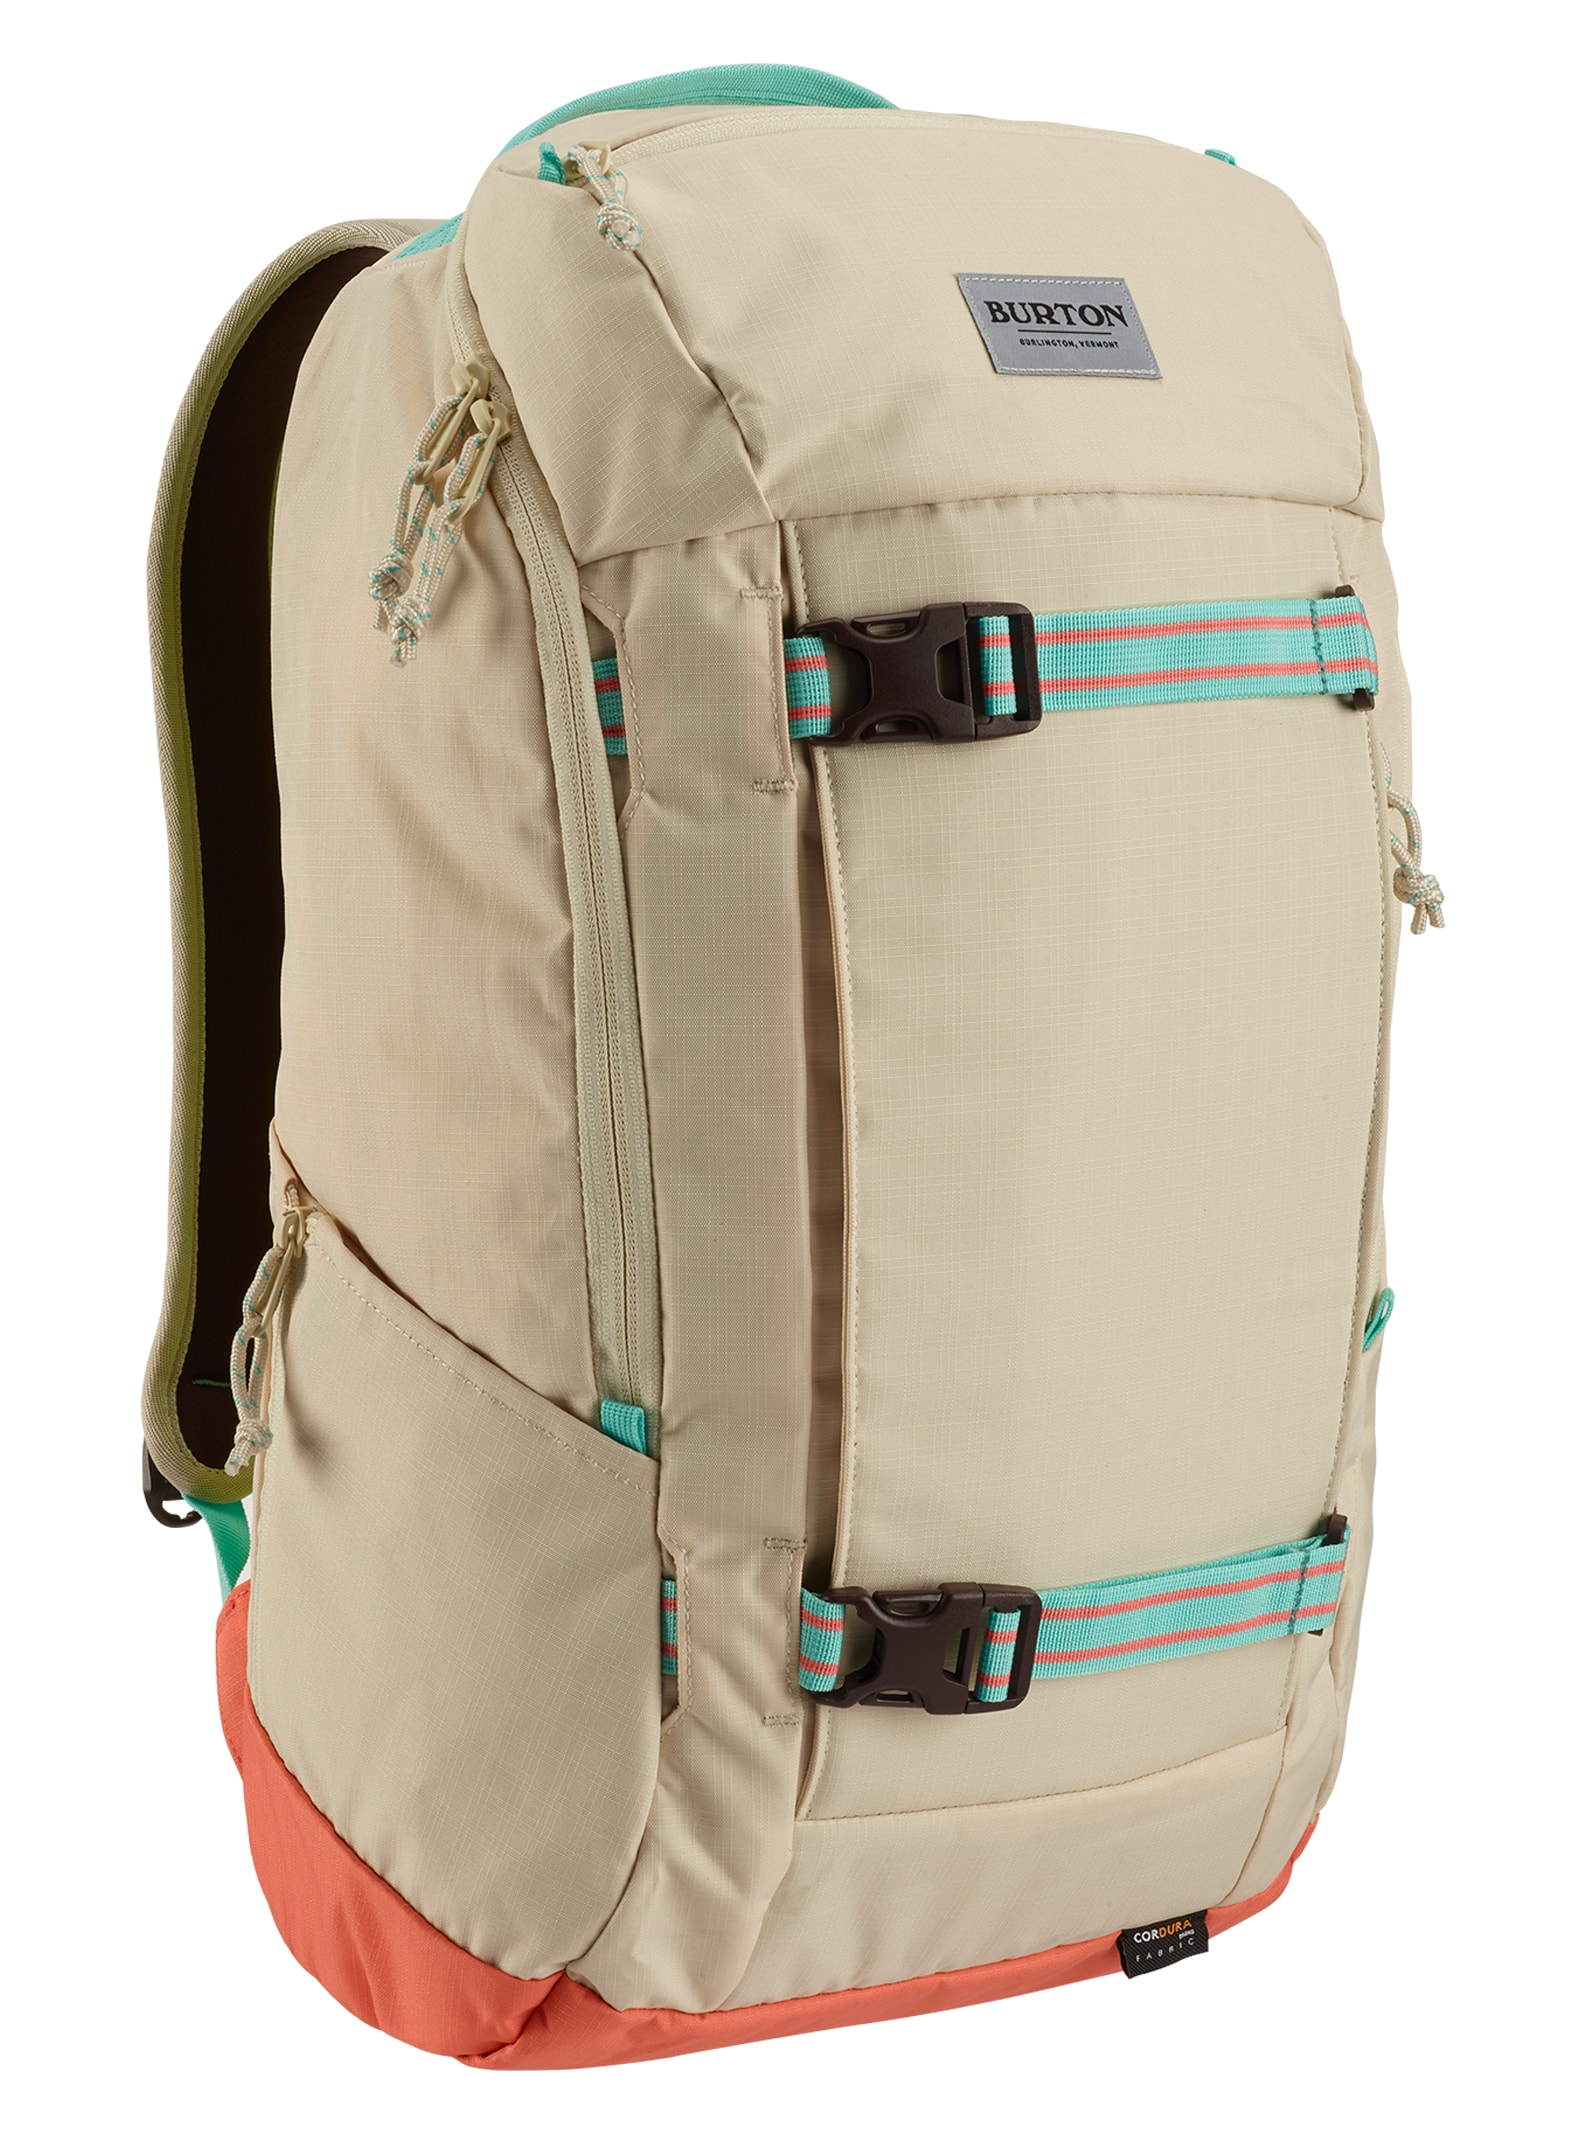 Backpack Travel Bag Shopping Bag Storage Bag For Men Women Girls Boys Personalized Pattern Silk Rose School Bag